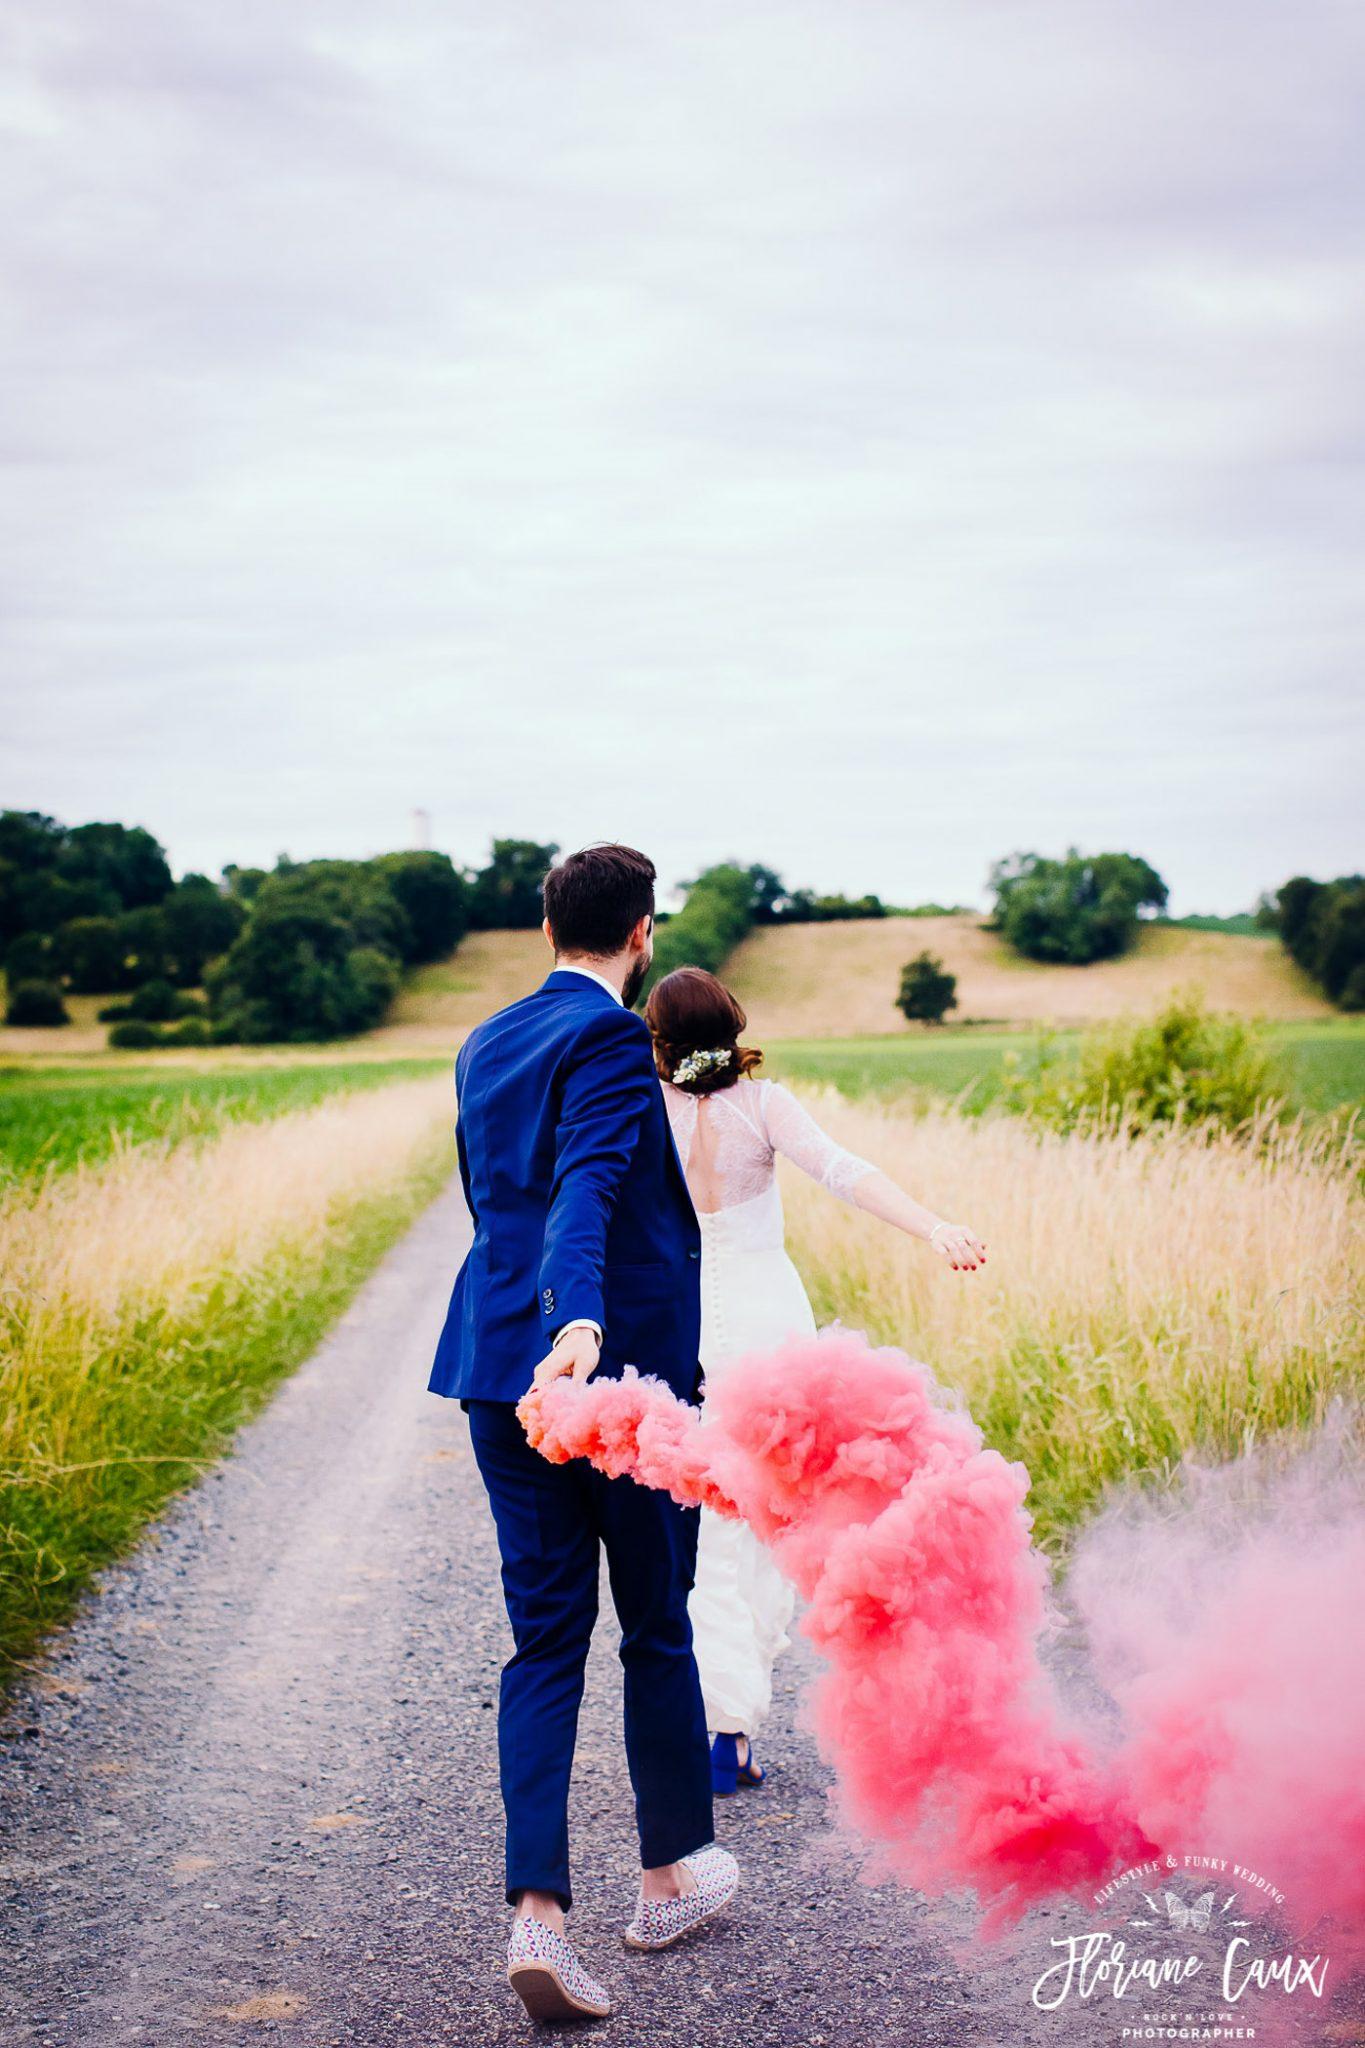 photographe-mariage-pays-basque-Floriane-Caux (51)